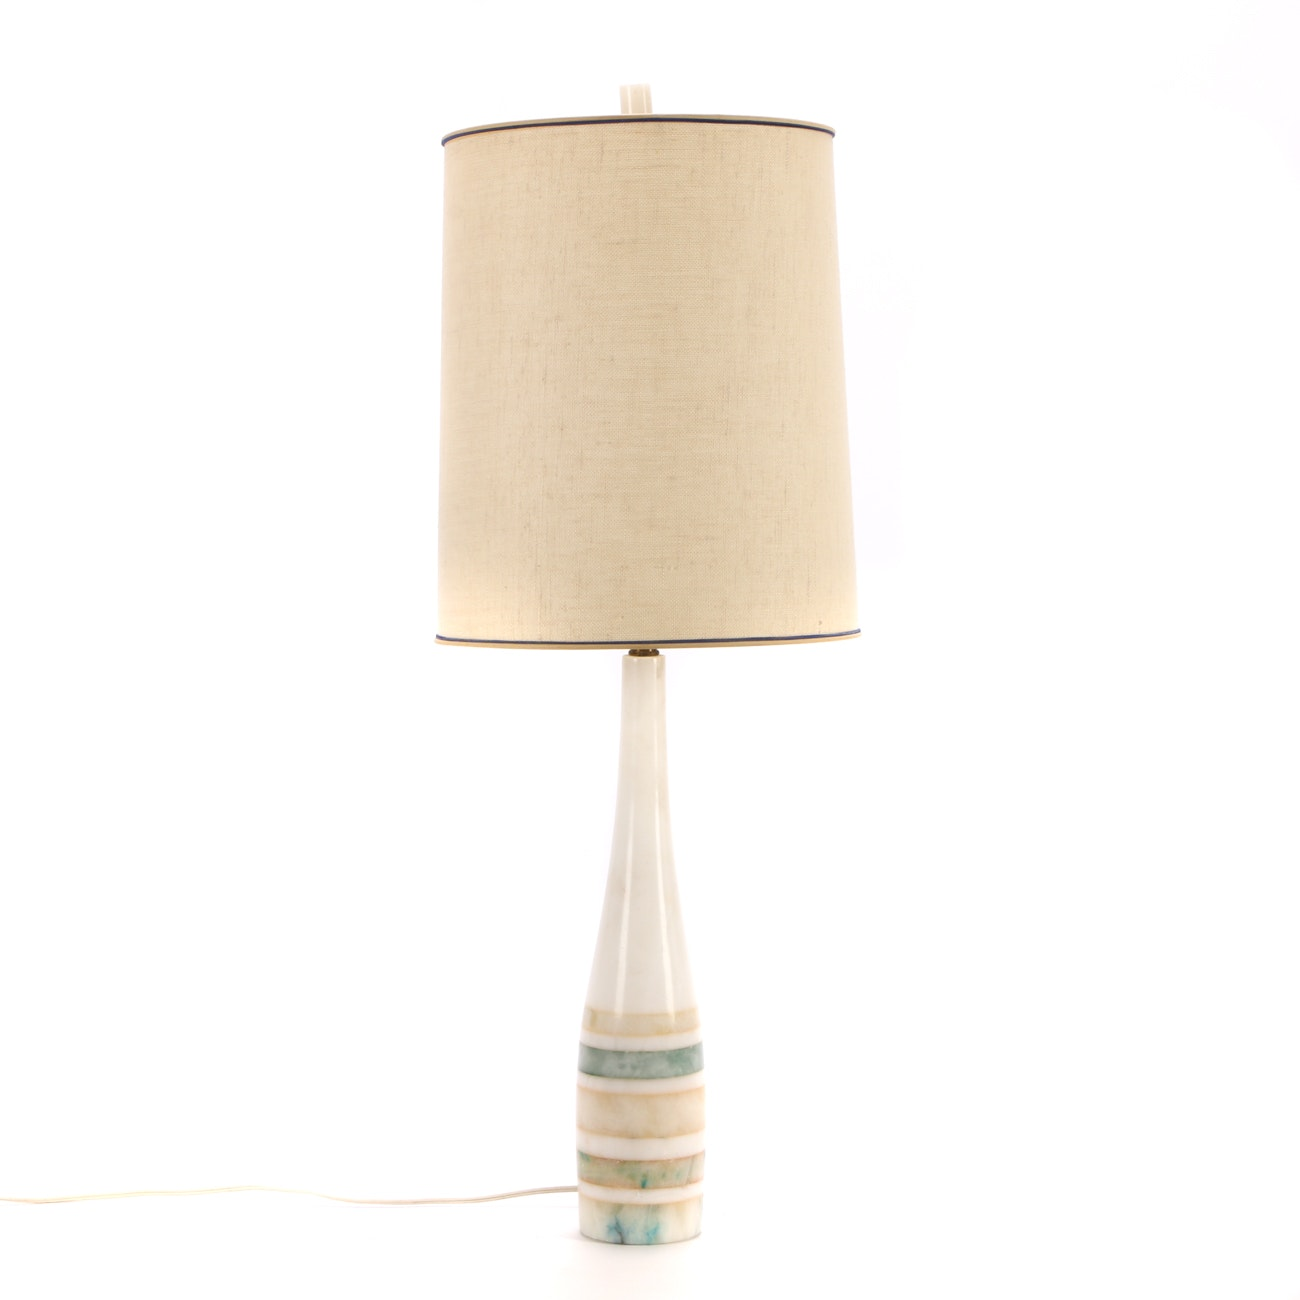 Mid Century Modern Marble Table Lamp